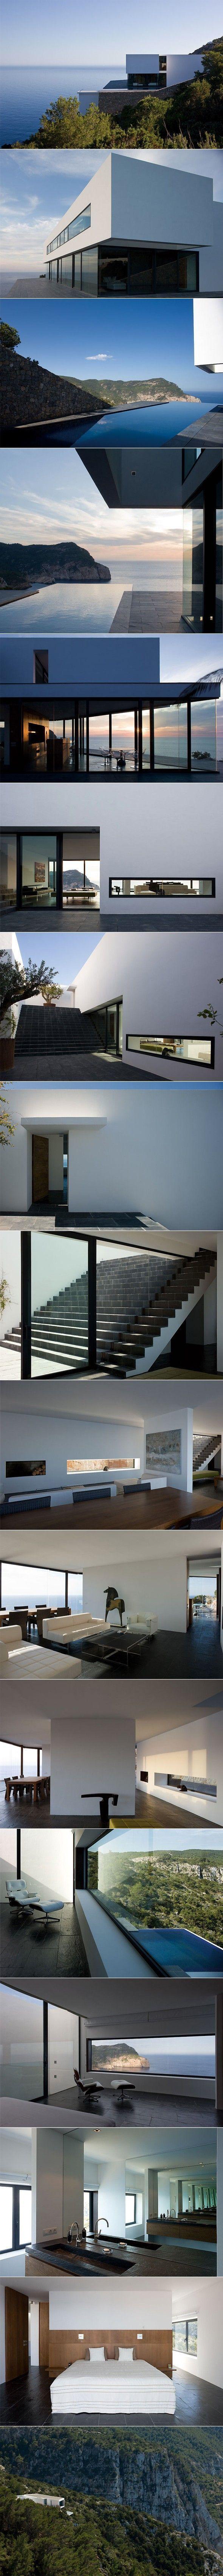 ARCHITECTURE >>> Maison AIBS par Bruno Erpicum and Partners - Journal du Design  ~ Great pin! For Oahu architectural design visit http://ownerbuiltdesign.com